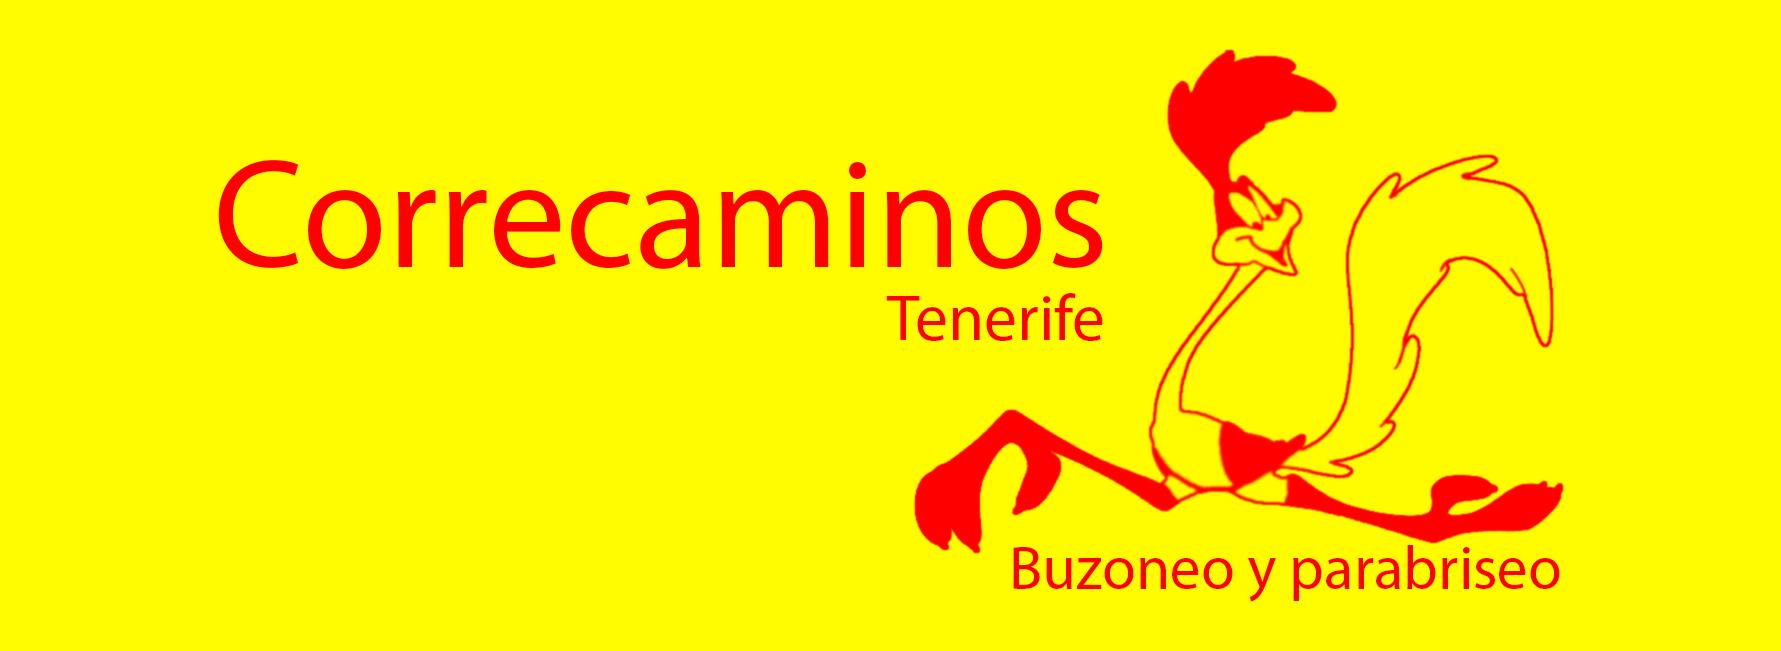 Correcaminos Tenerife